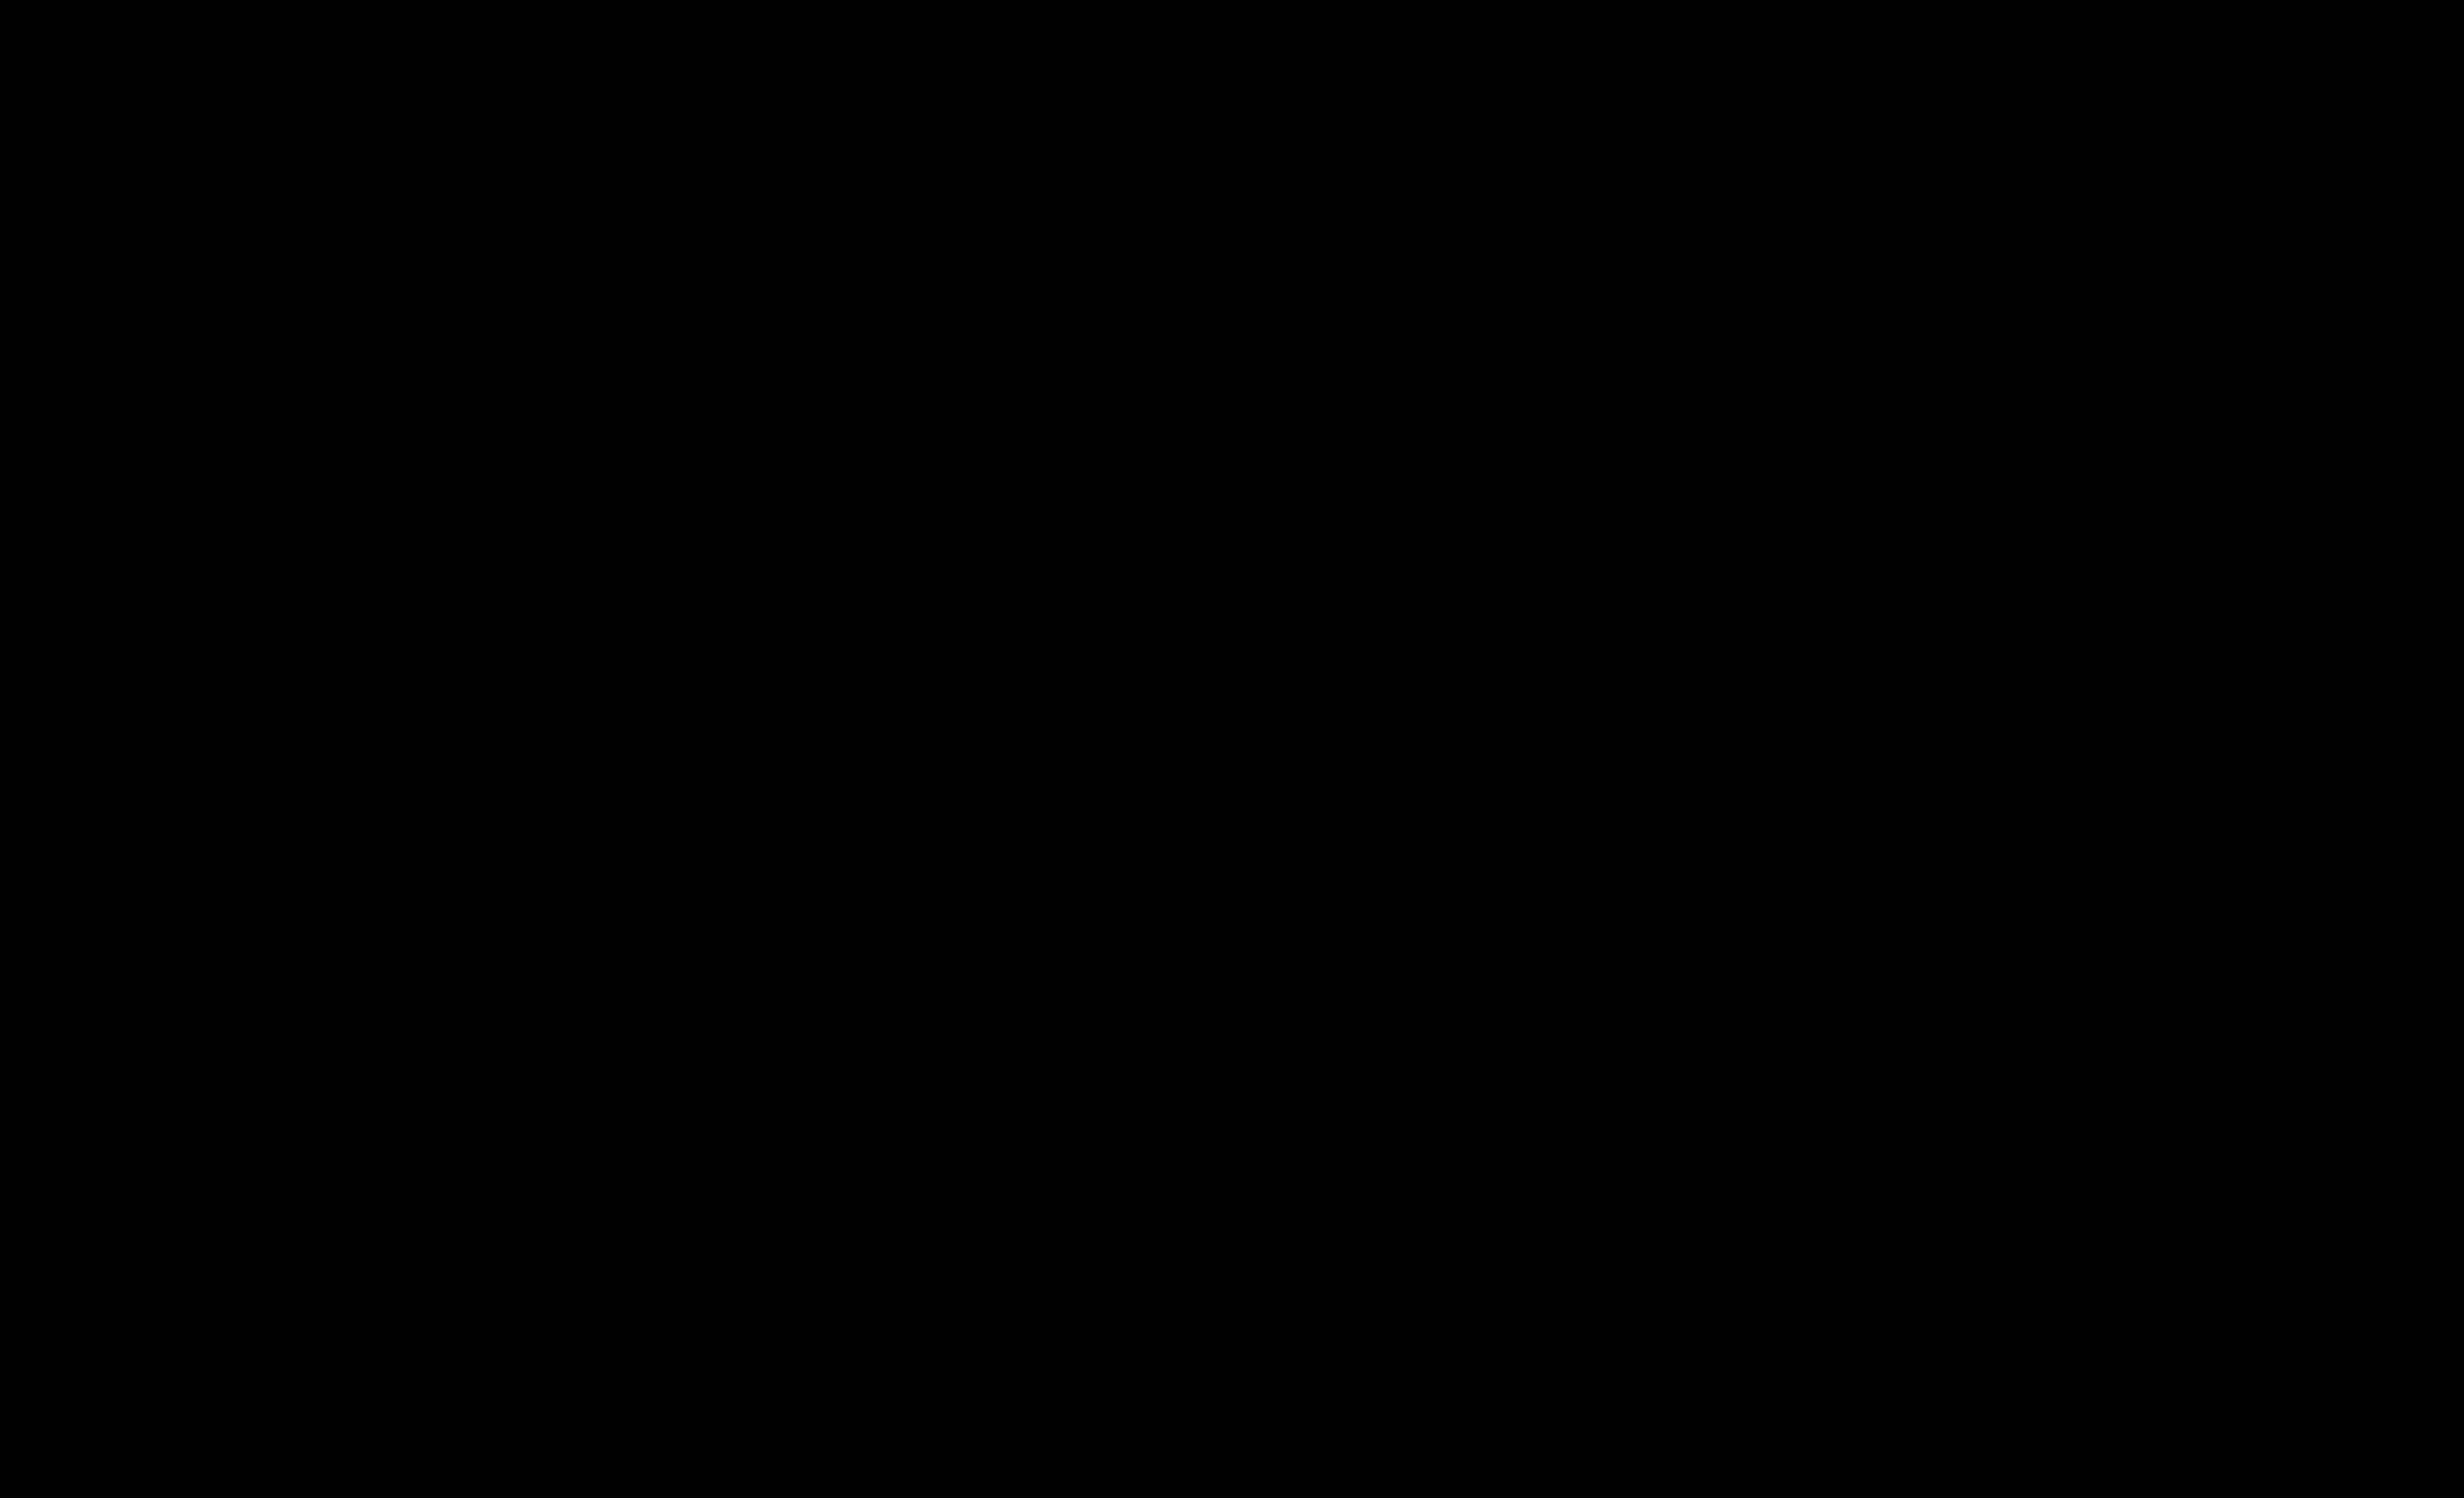 20200205_133726